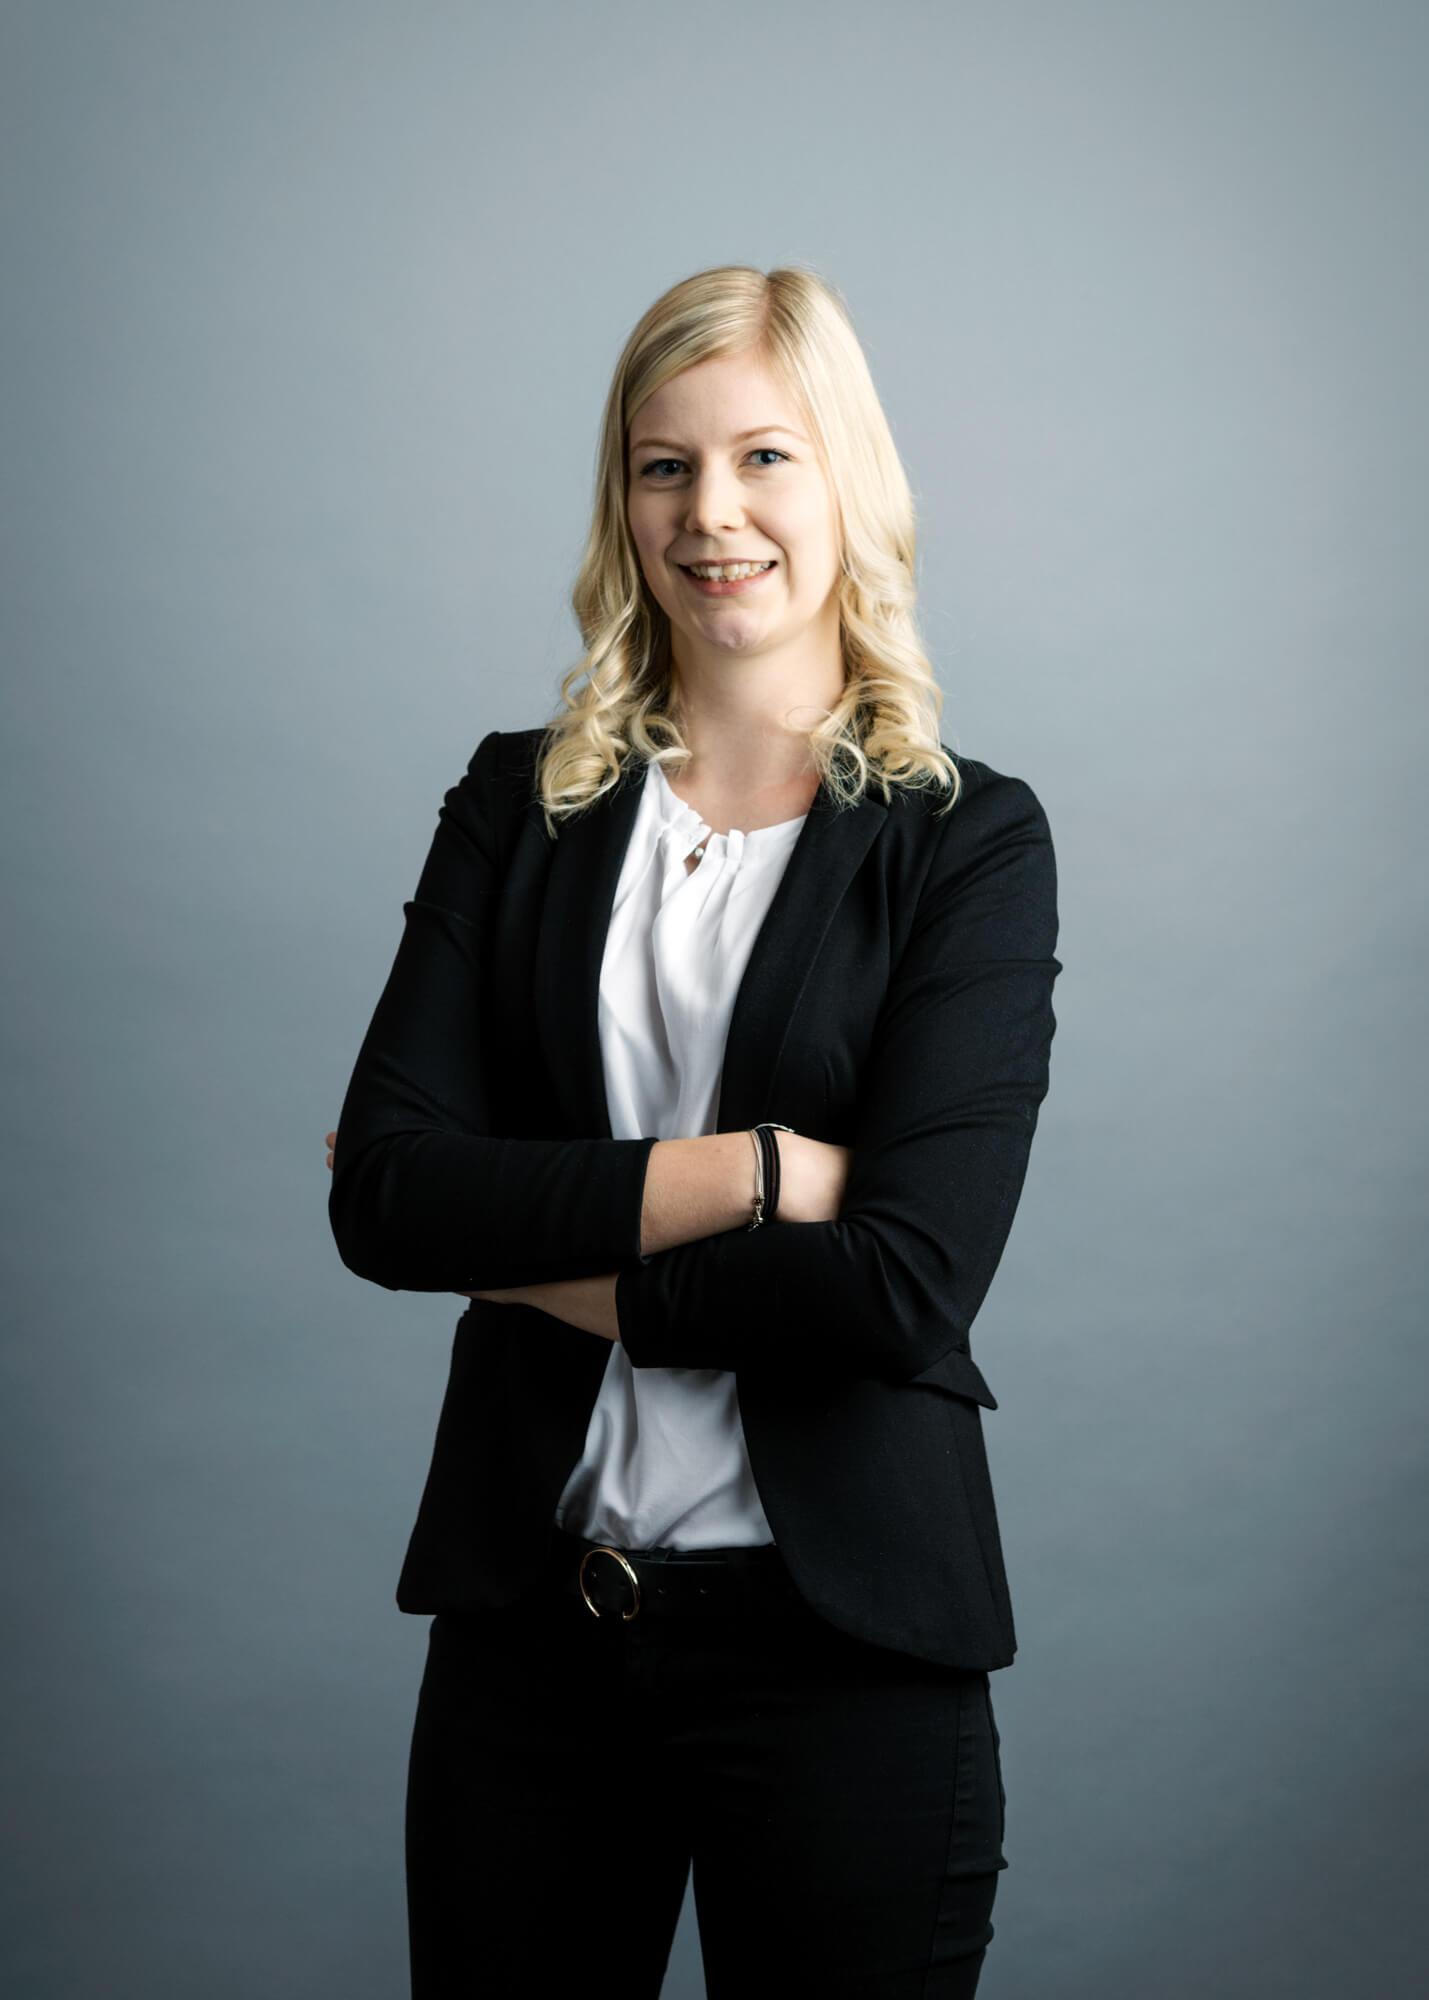 Michaela Kernbichler